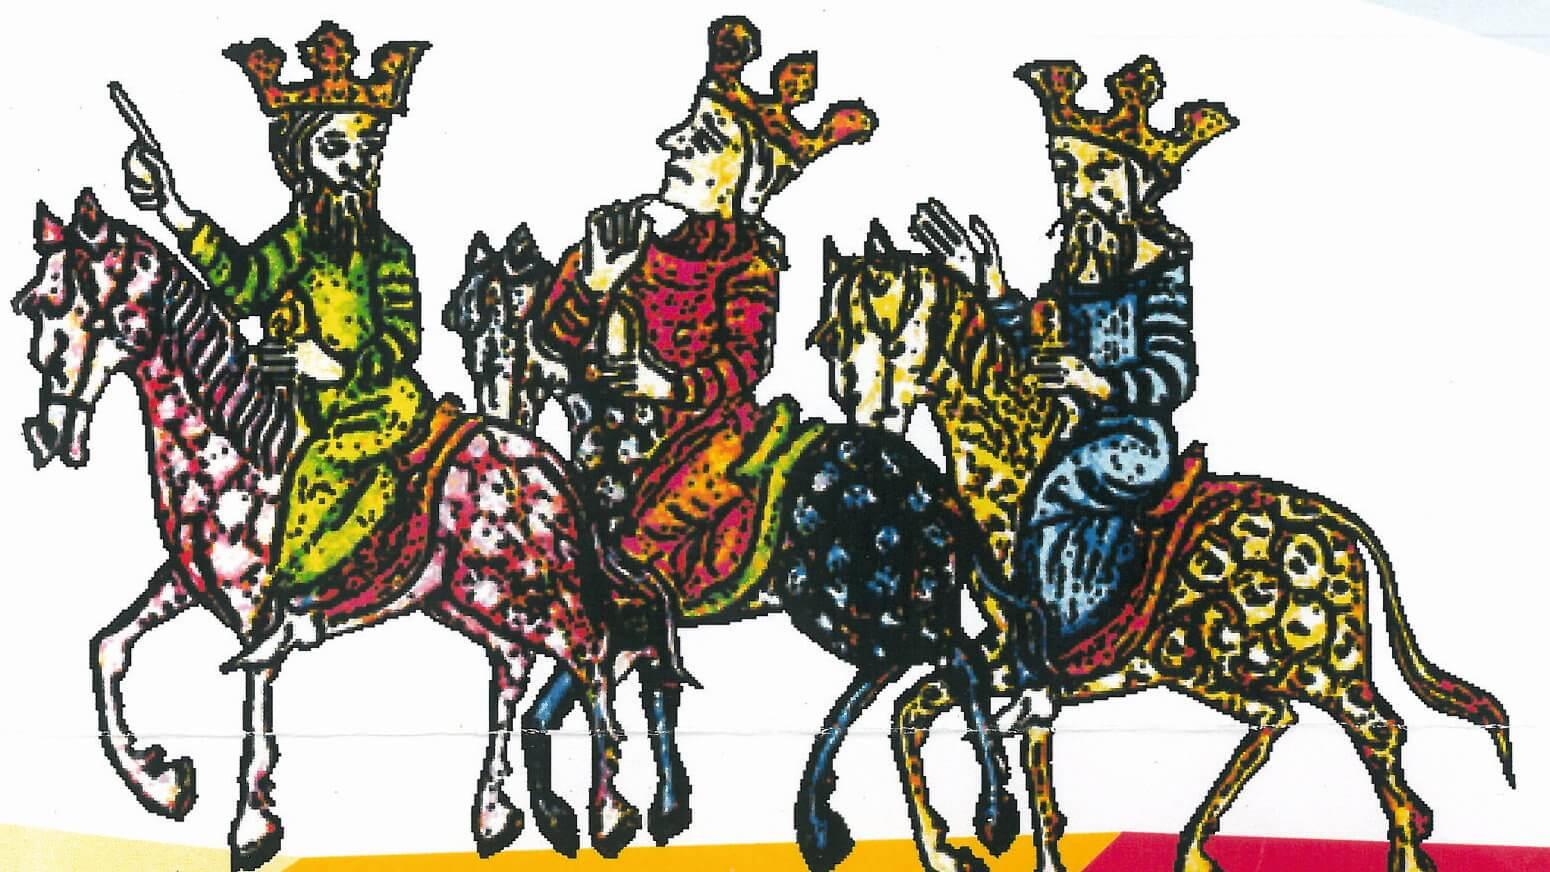 Rysunek Trzech Króli